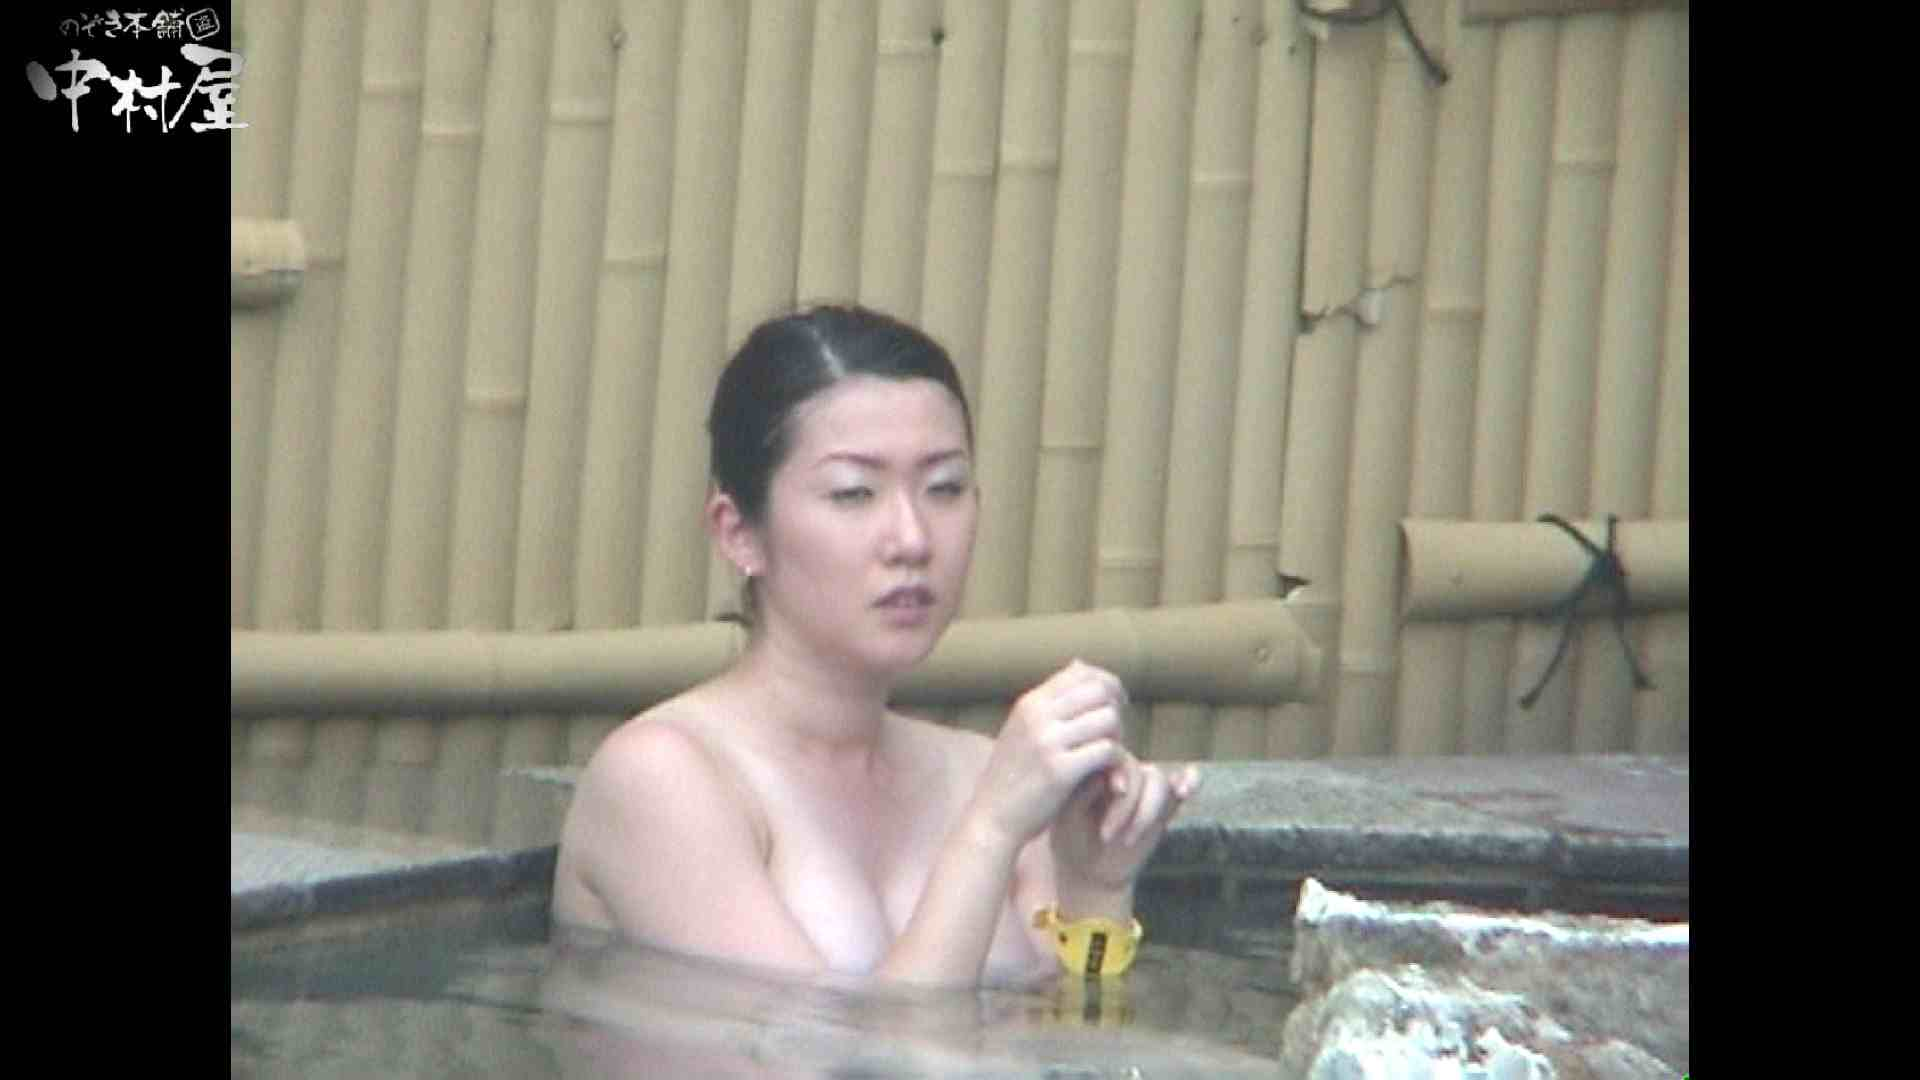 Aquaな露天風呂Vol.961 OLセックス | 盗撮  86画像 76